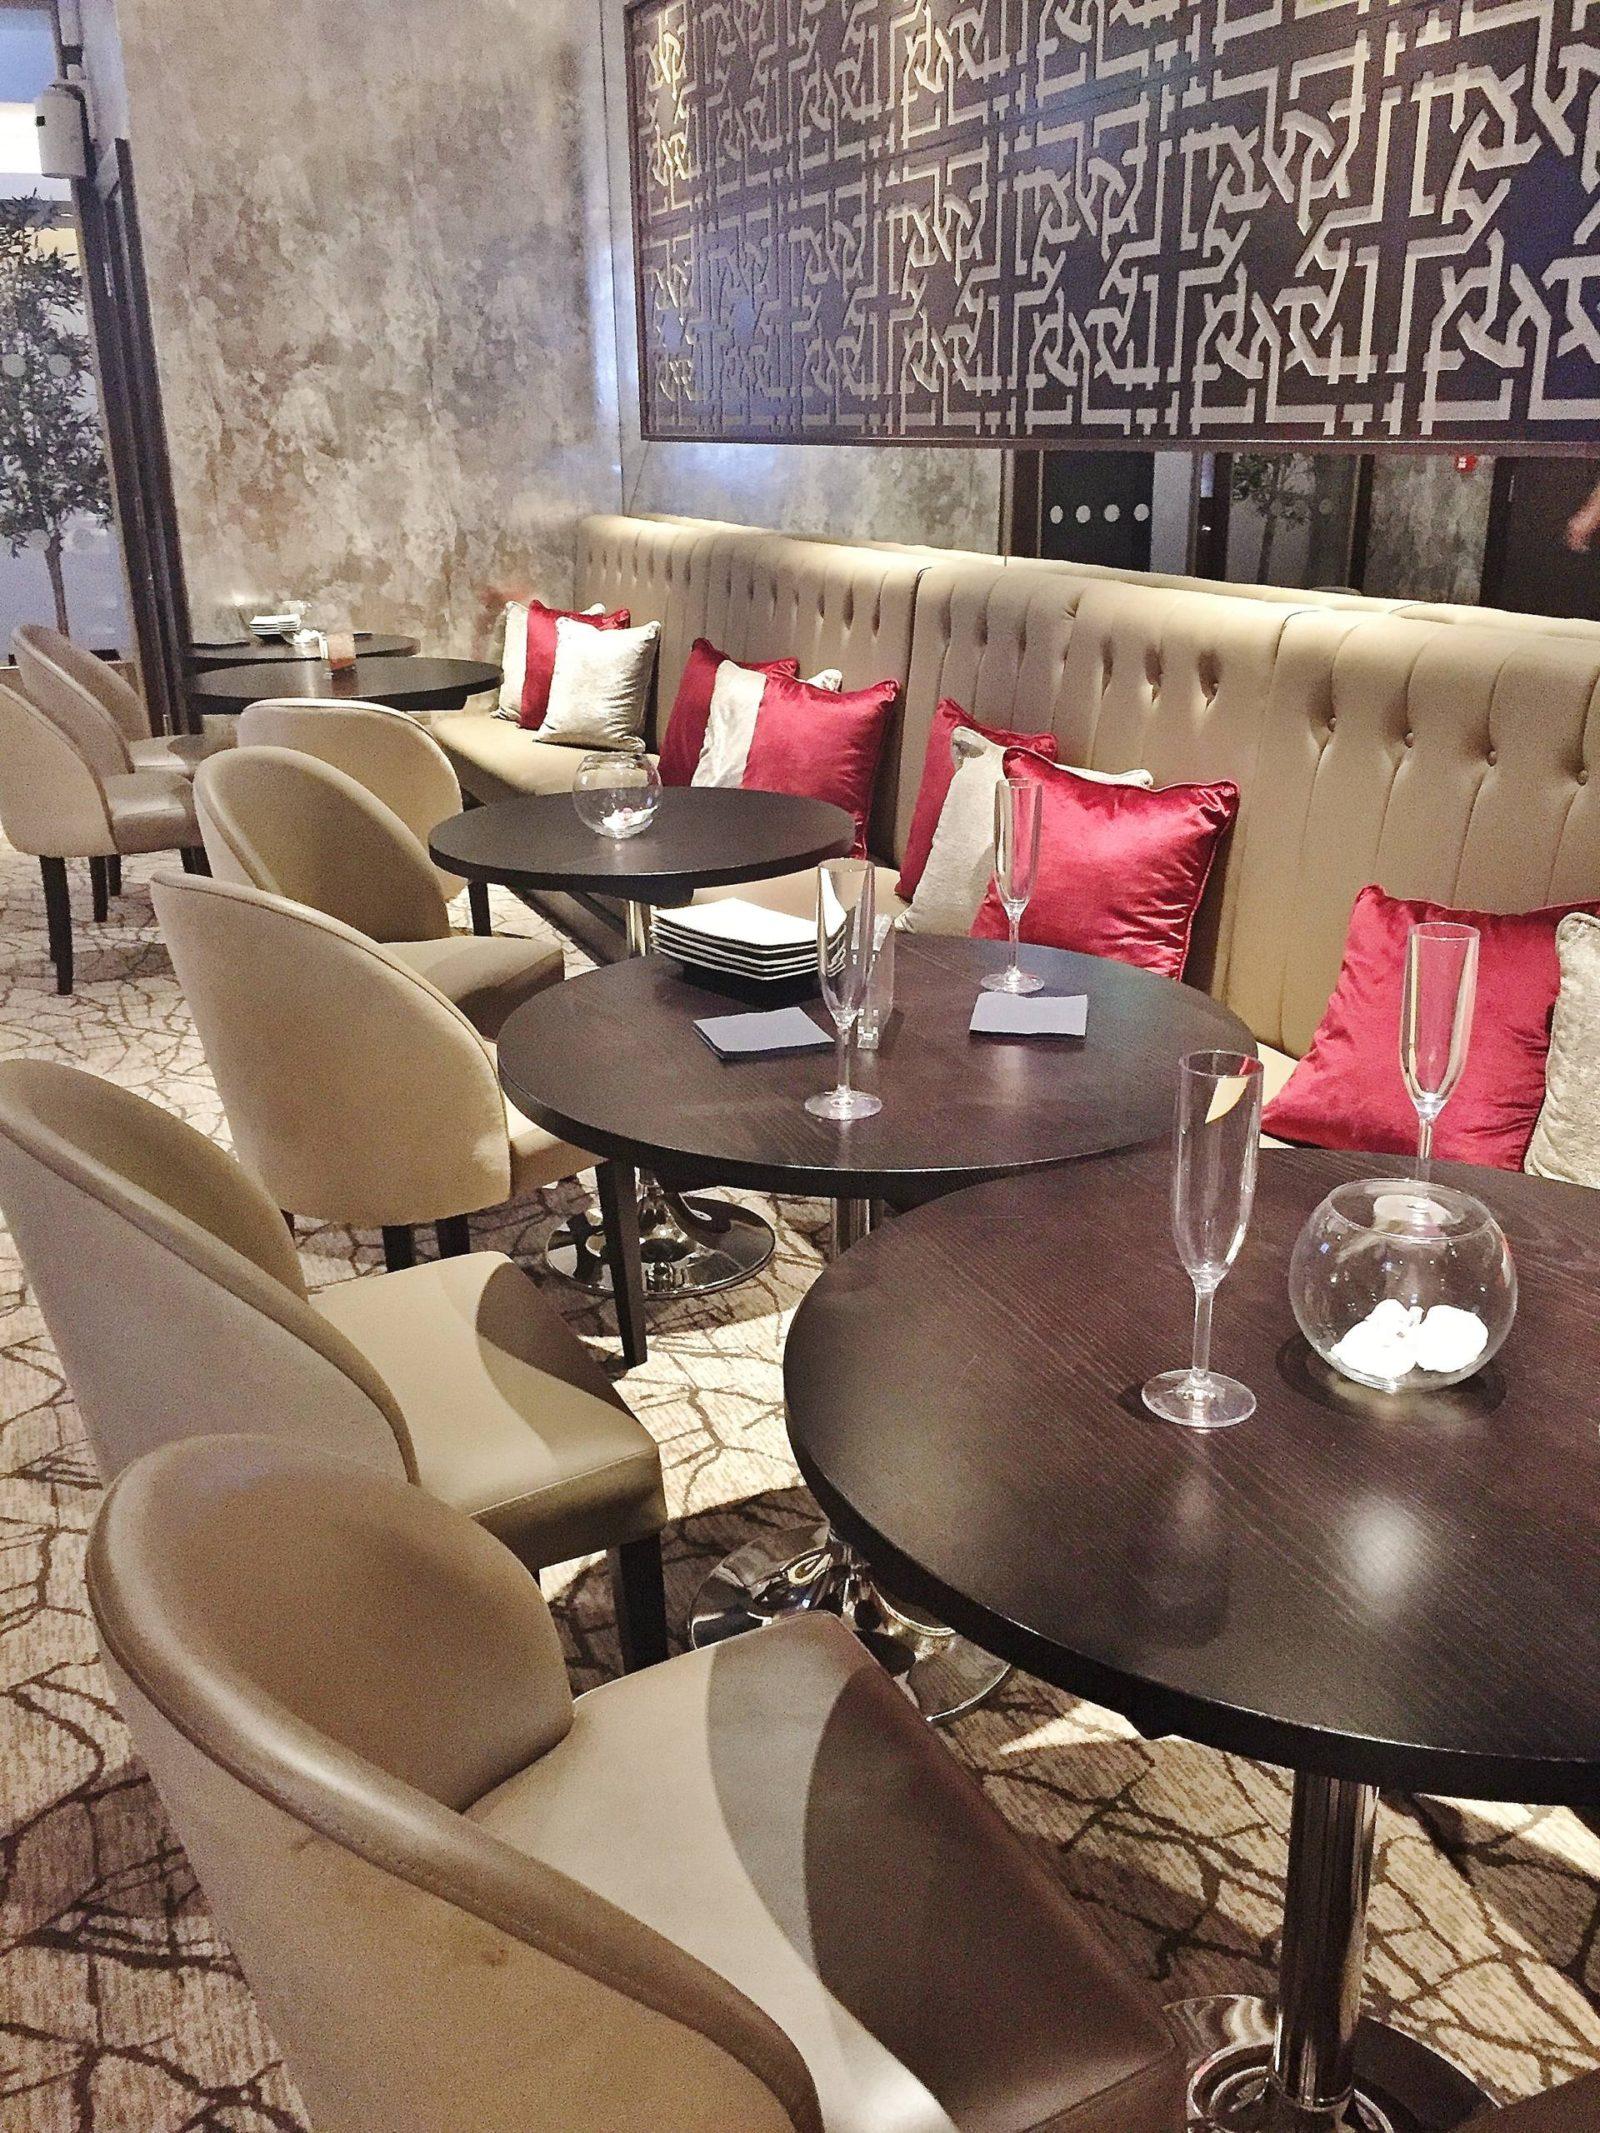 Santai Spa Genting Hotel Lounge Entrance